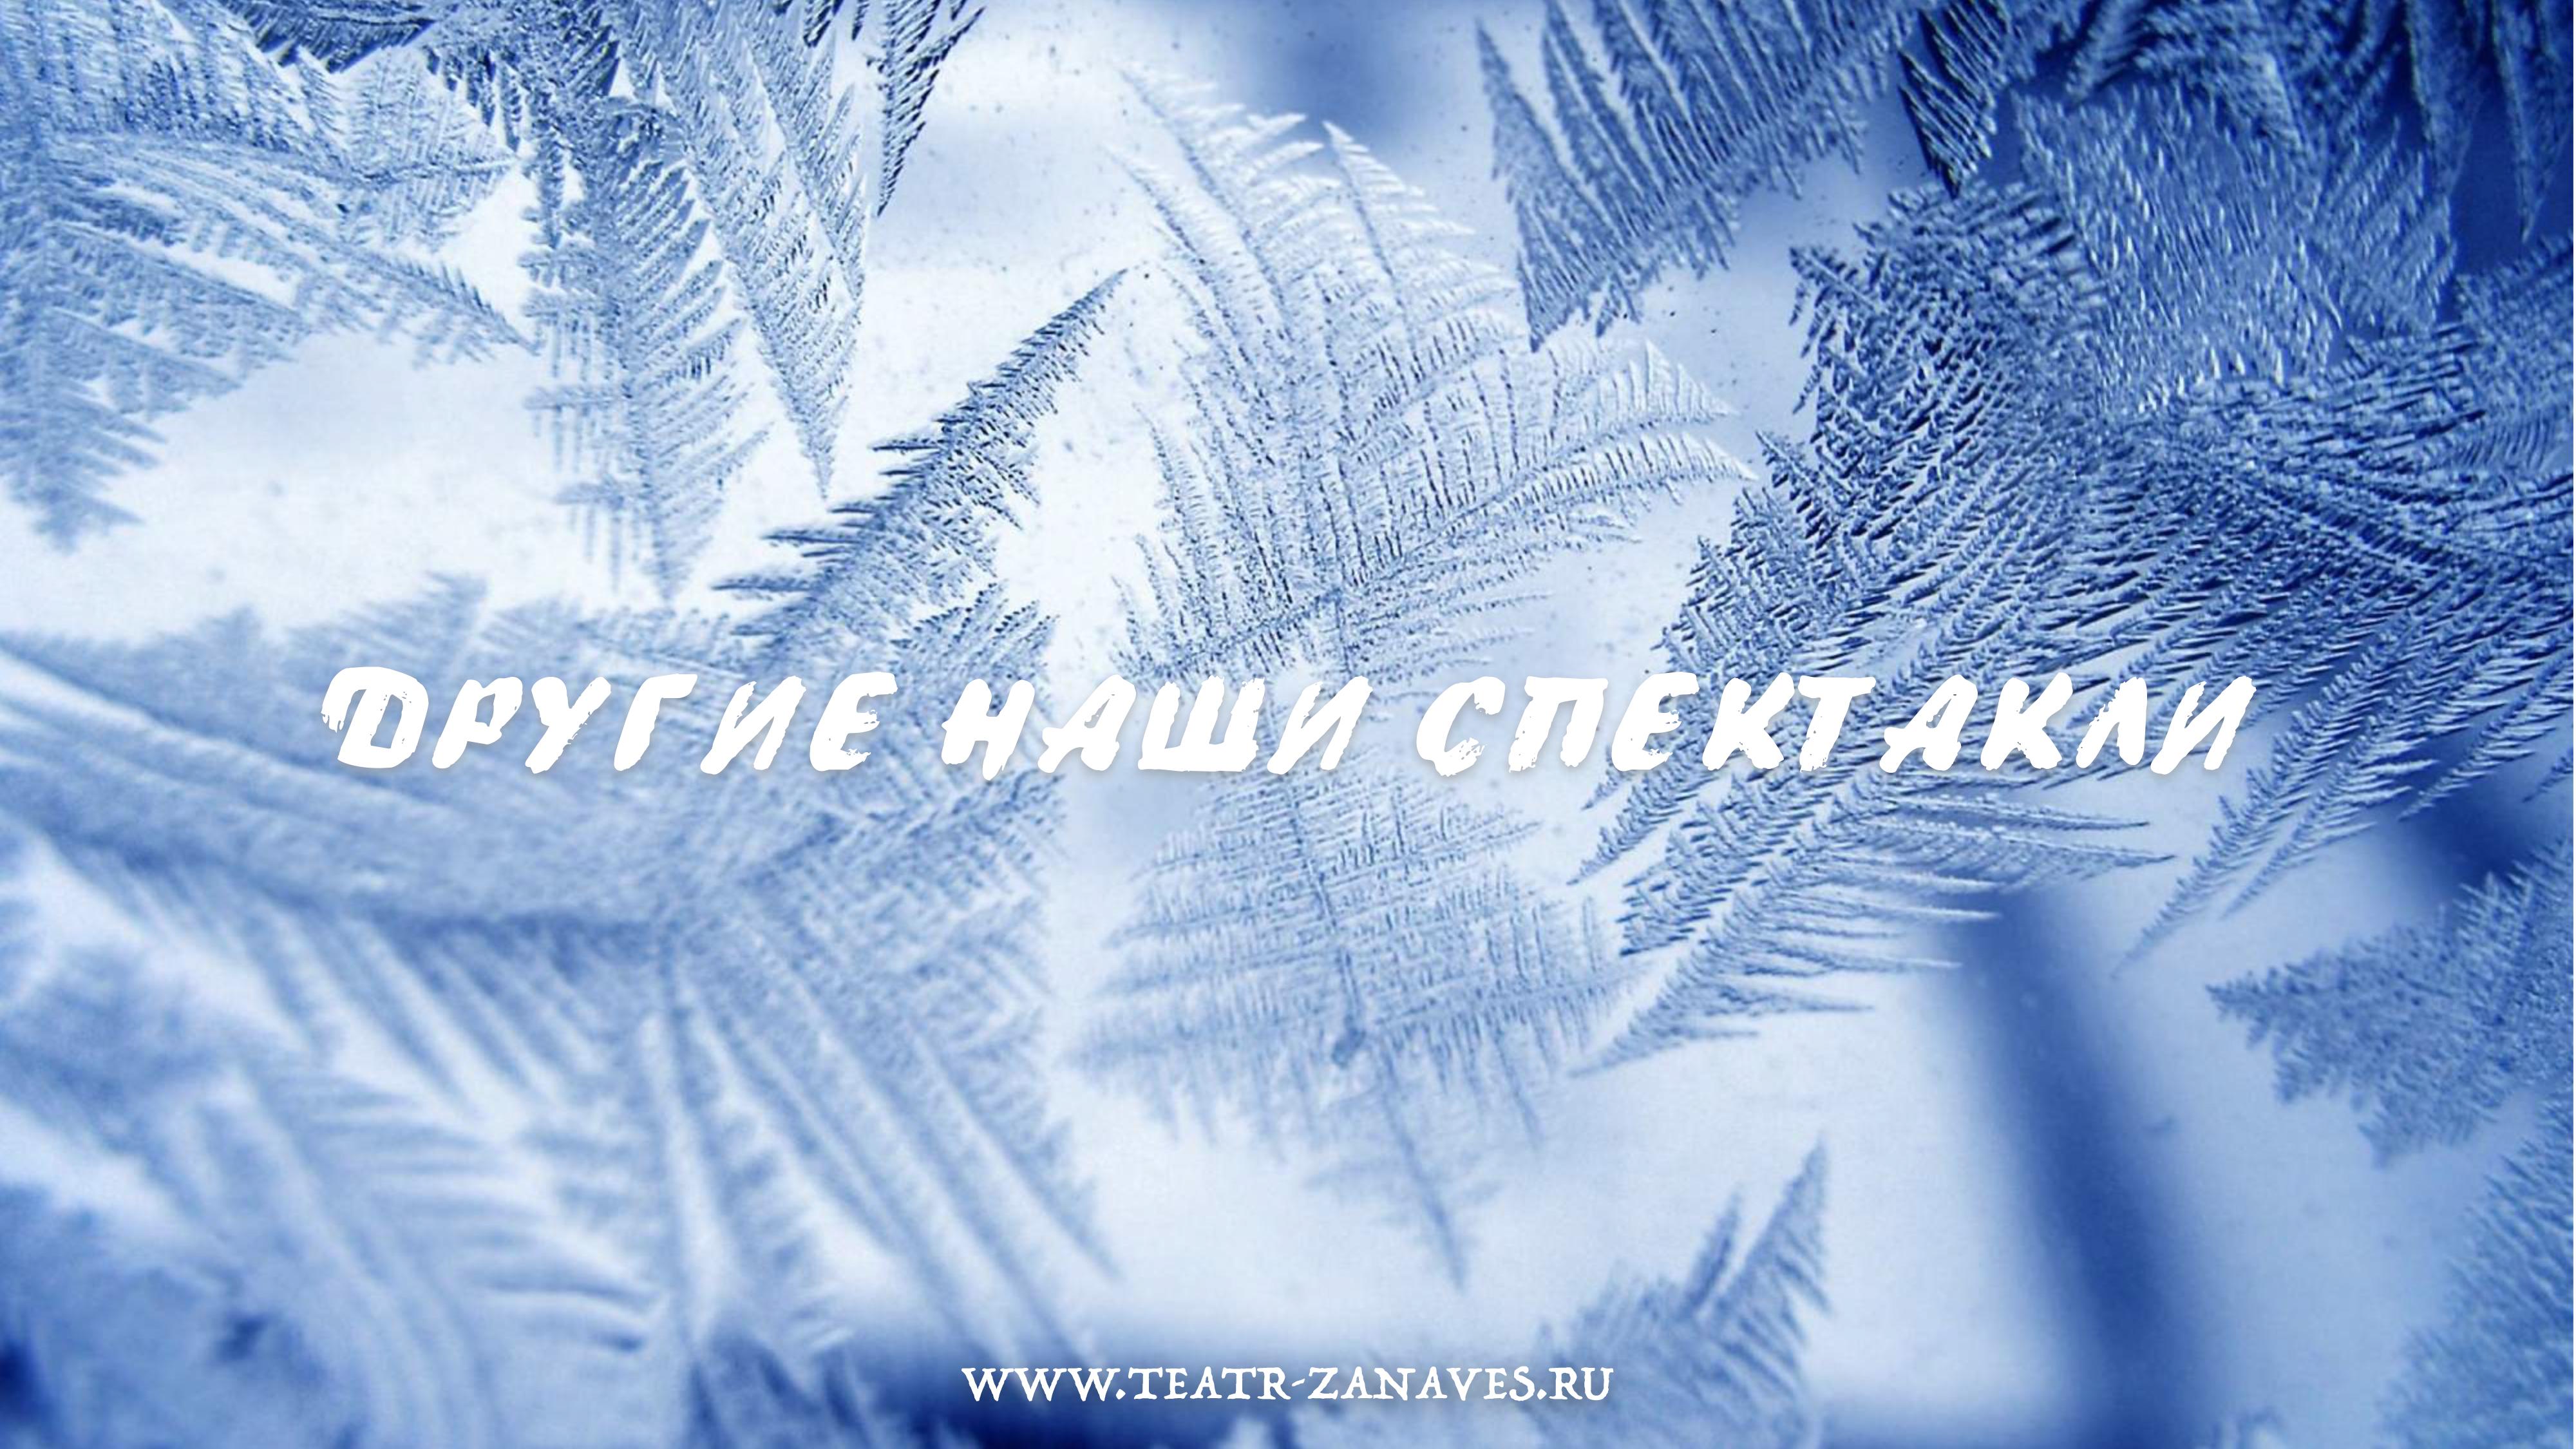 Spektakl-Moroz-Ivanovich-6